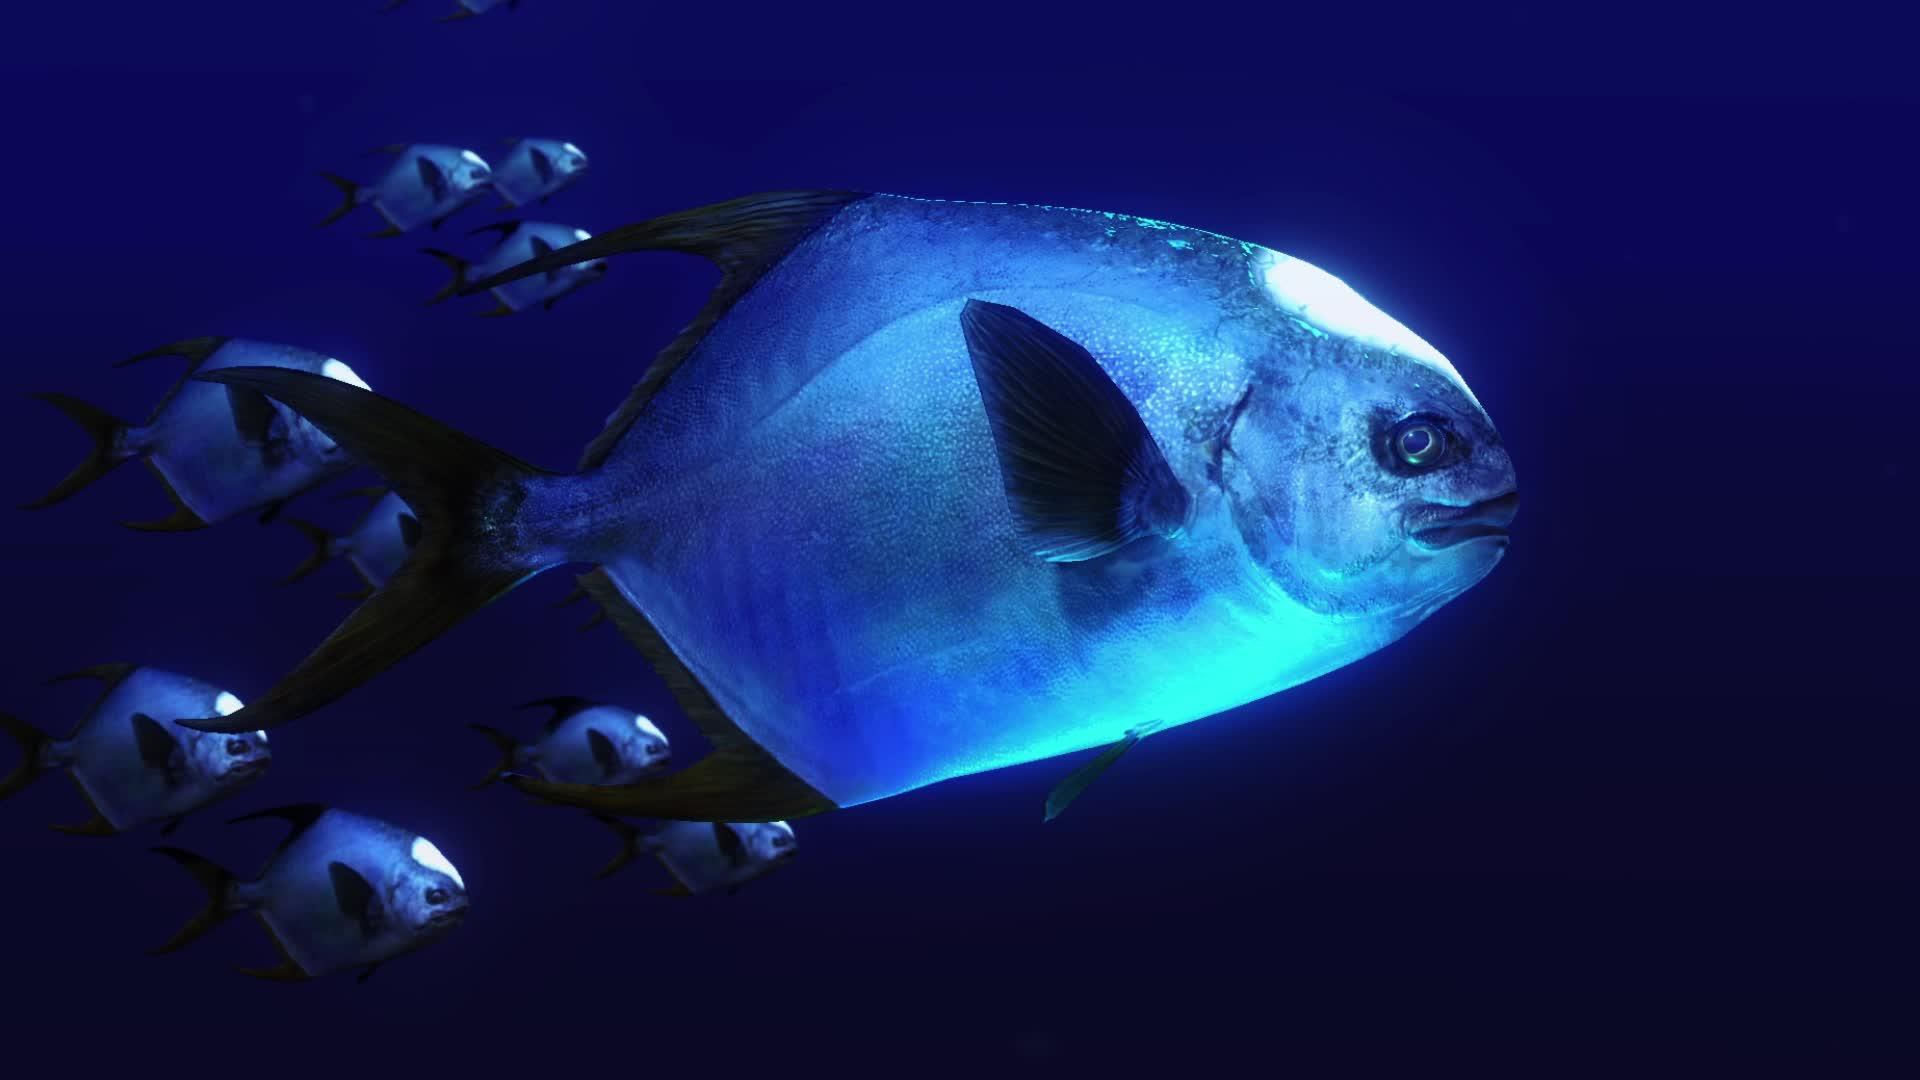 animalgifs, gamedevscreens, indiegames, Debris Flashlight Fish  GIFs